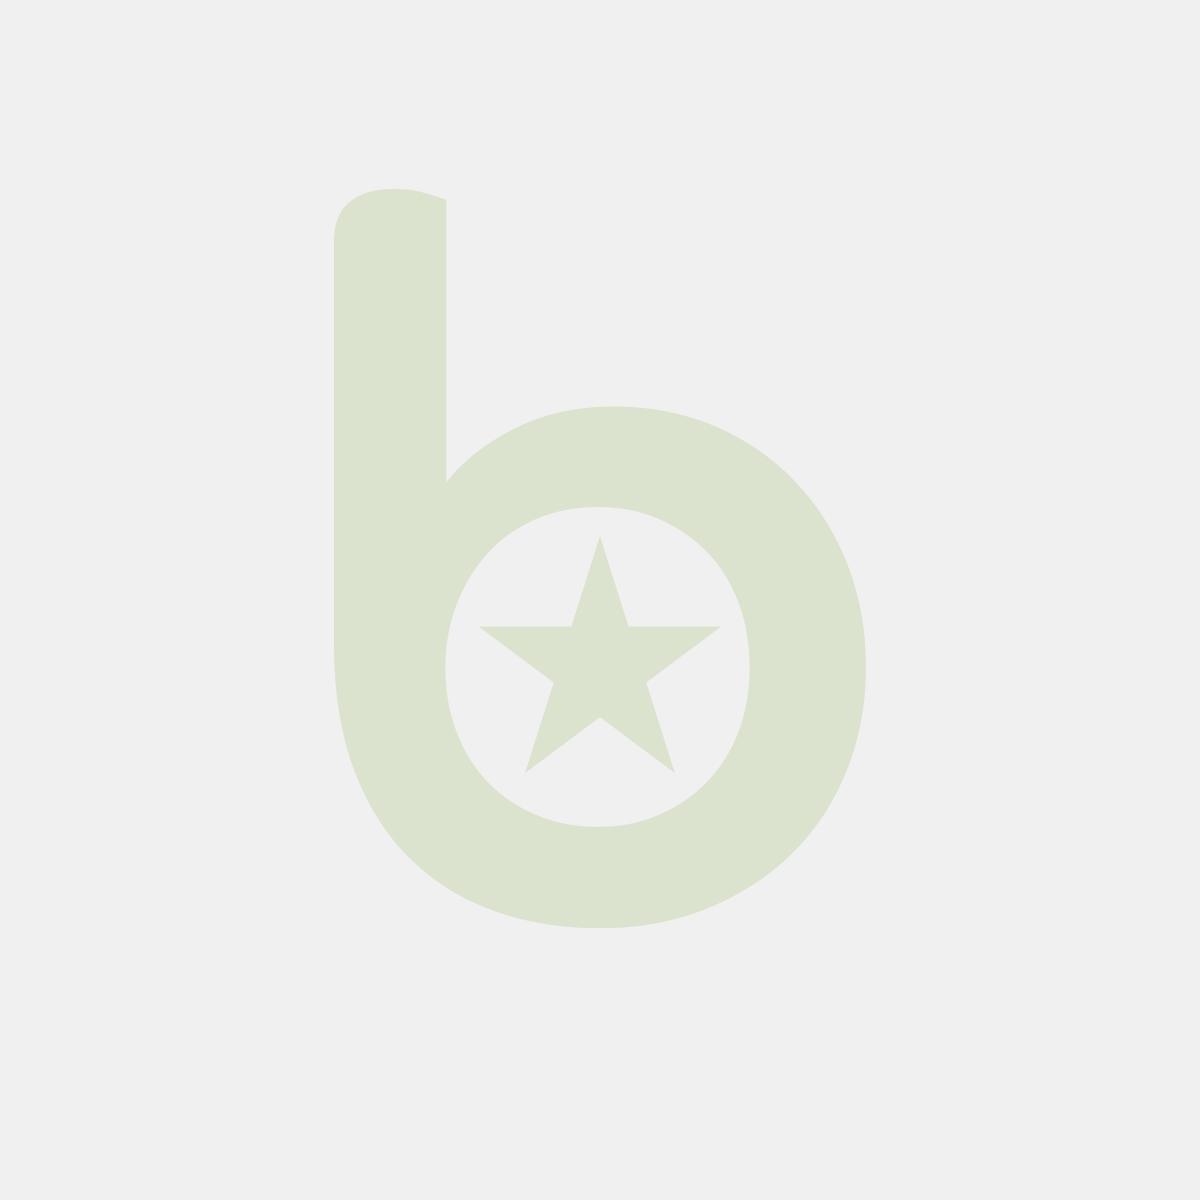 Wkład filtracyjny BWT PREMIUM M - kod 238462